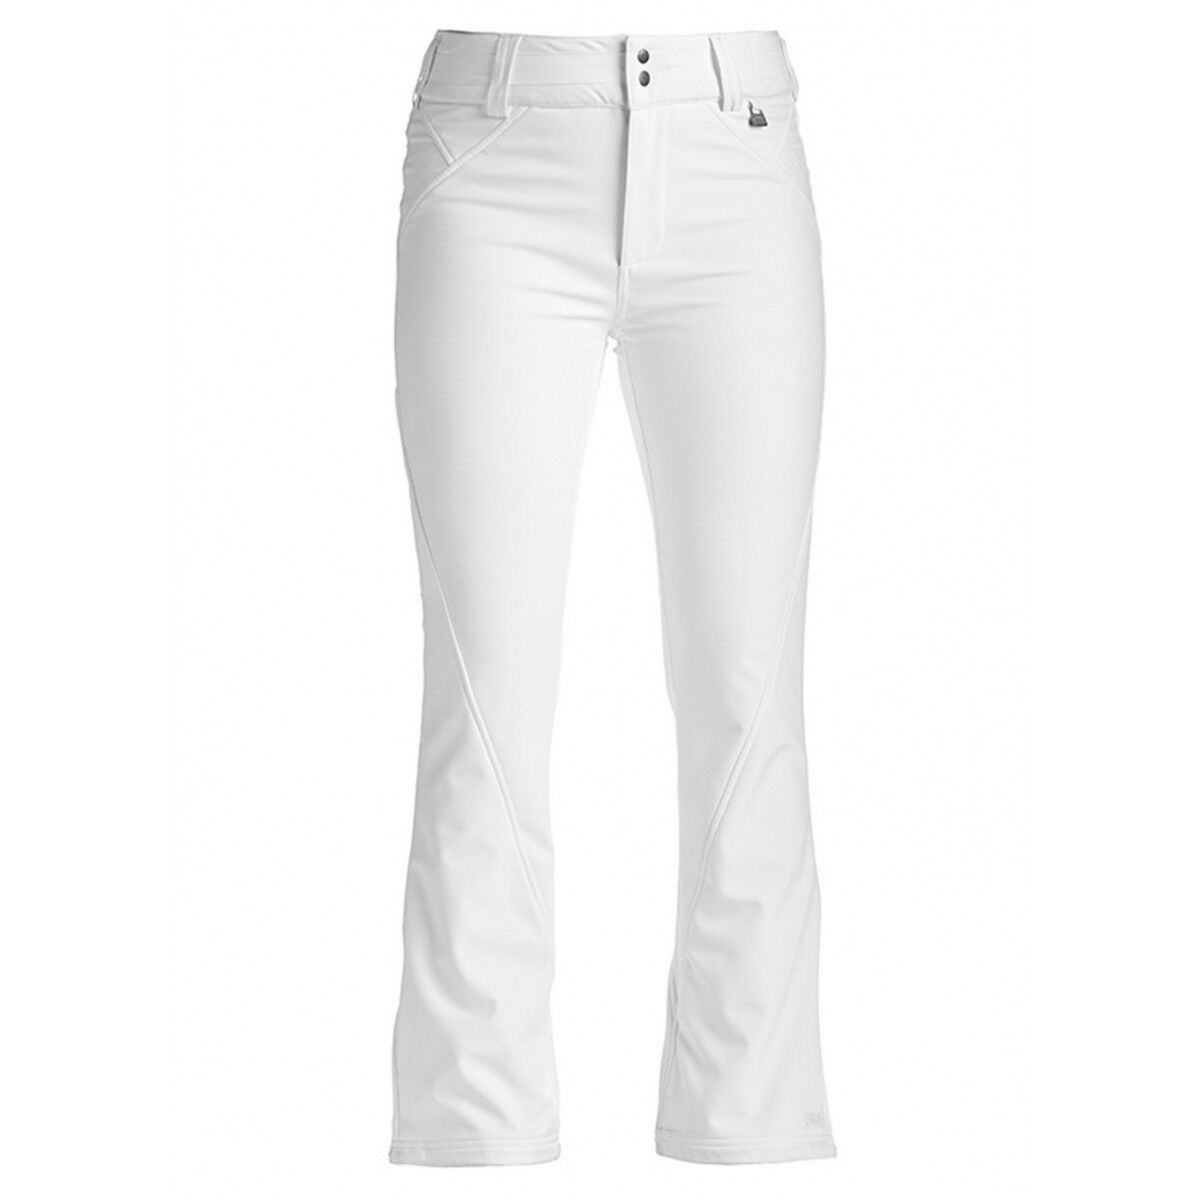 Women's NILS Betty Softshell Ski Pants WHITE Mid Rise Warm,